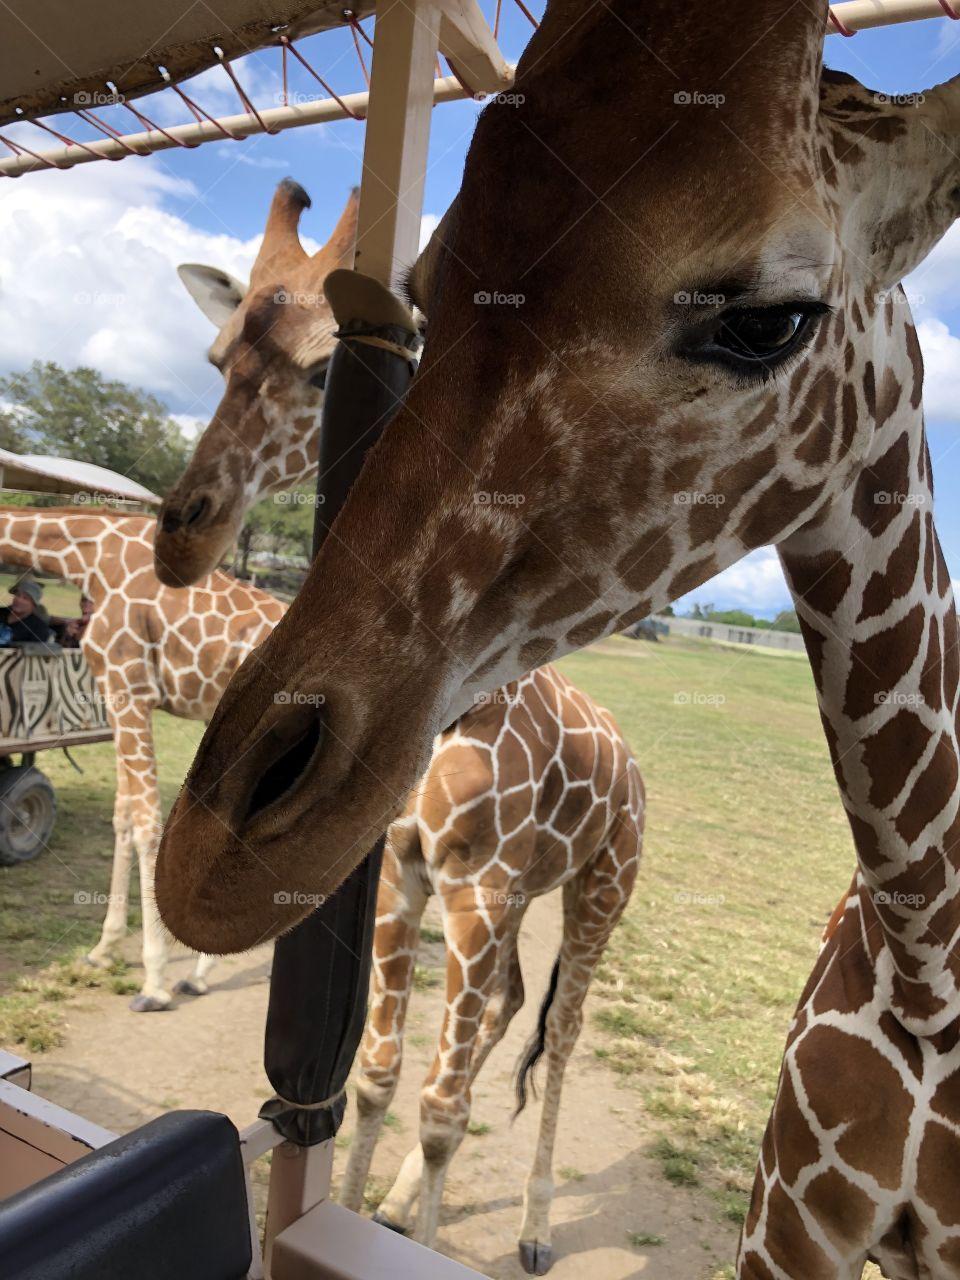 Up close giraffe